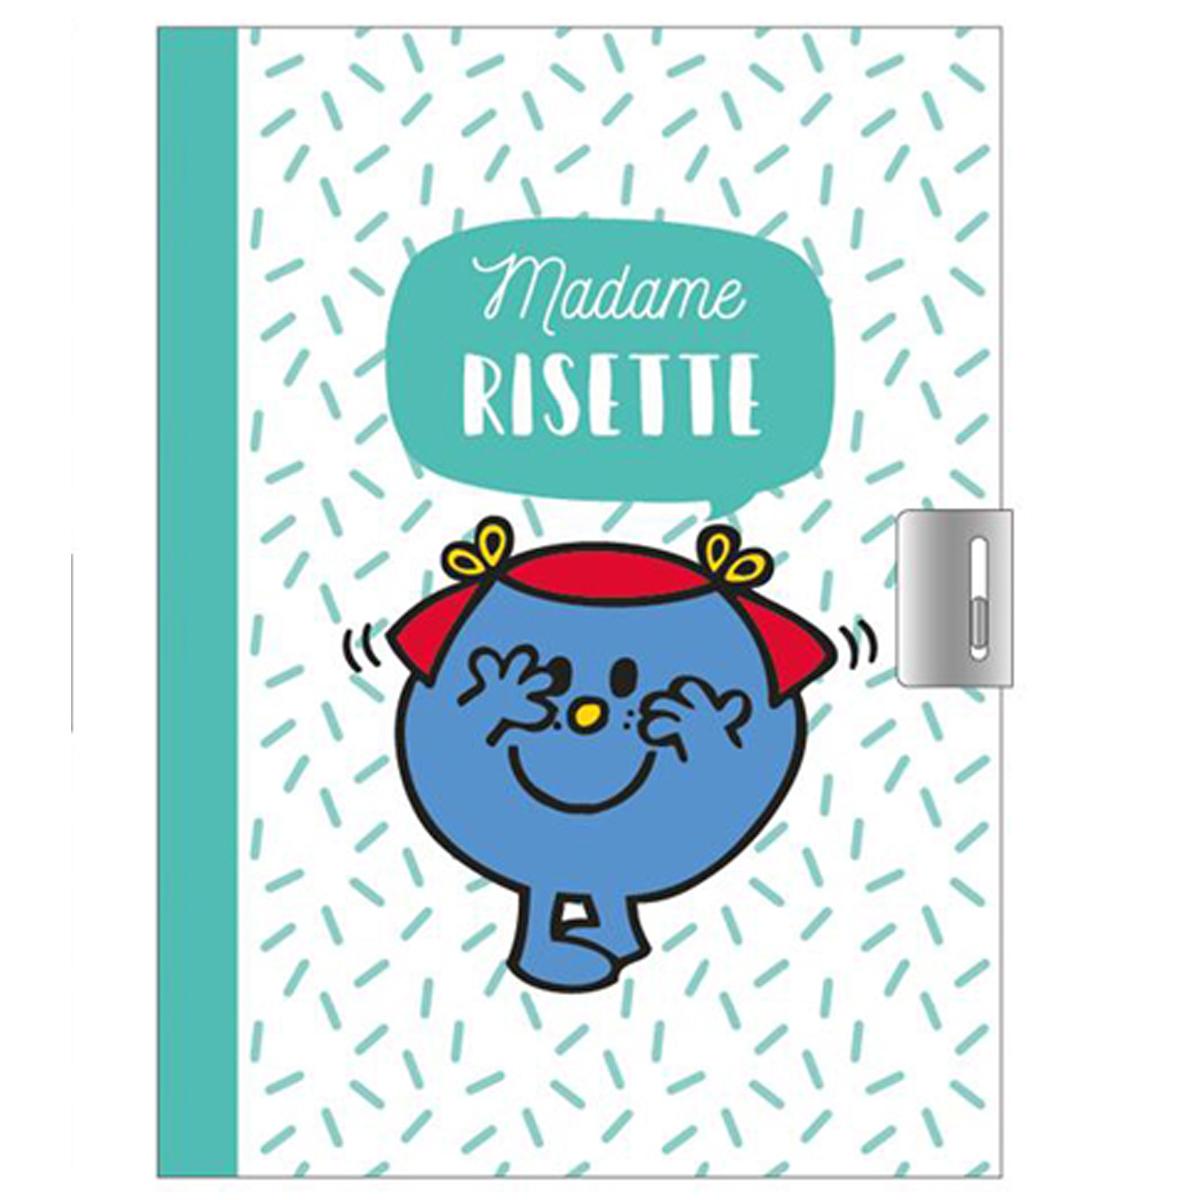 Journal Intime \'Monsieur Madame\' vert (Mme Risette) - 17x125 cm - [Q9303]